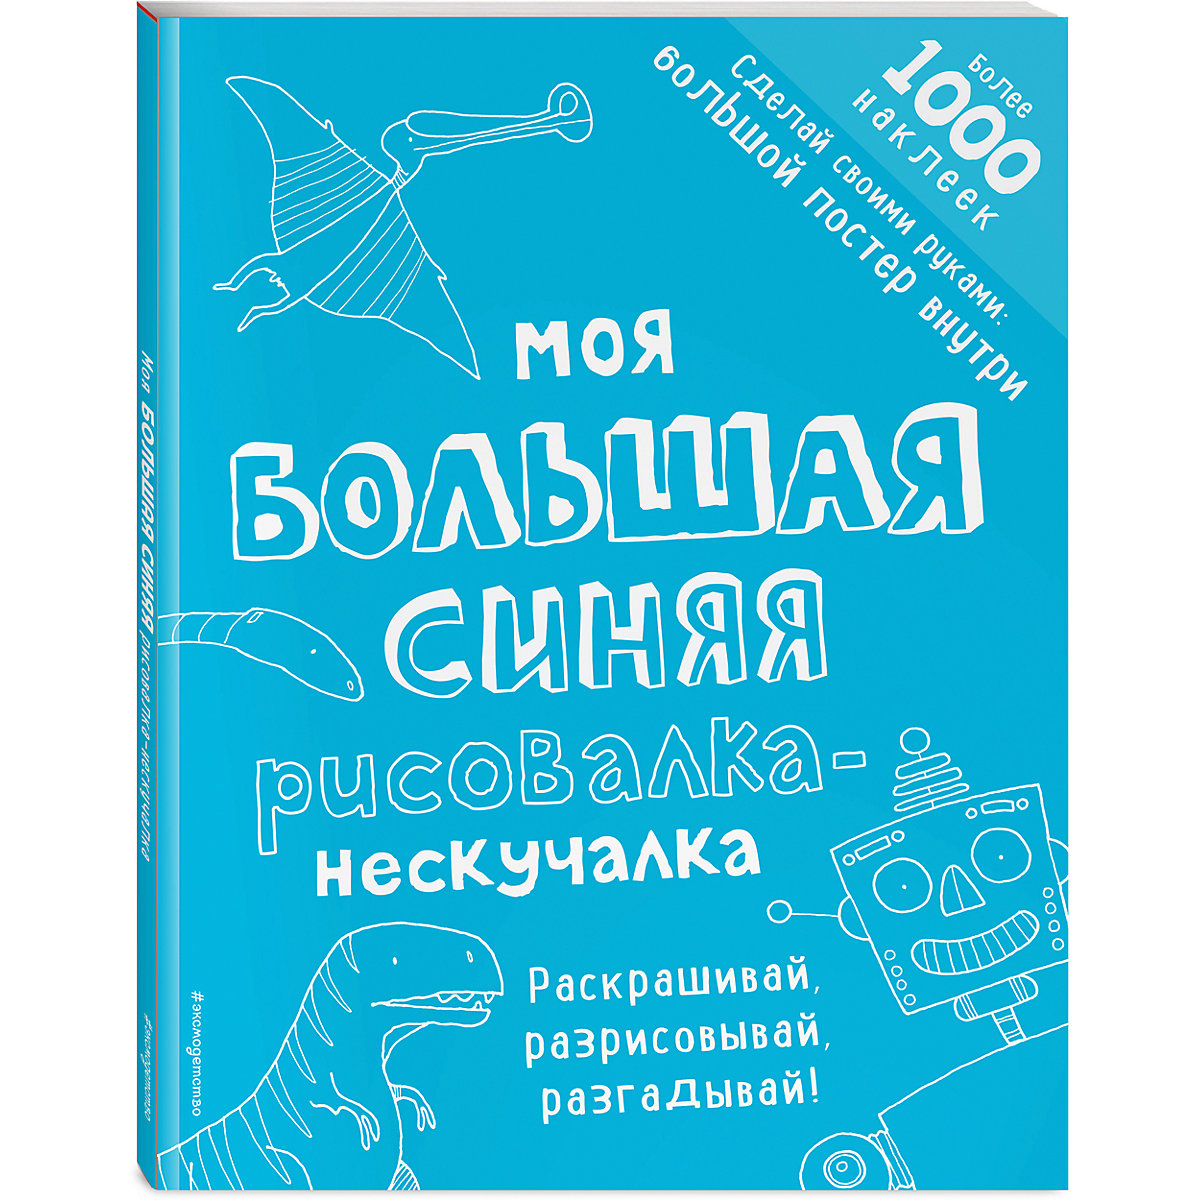 Books EKSMO 10757963 Children Education Encyclopedia Alphabet Dictionary Book For Baby MTpromo